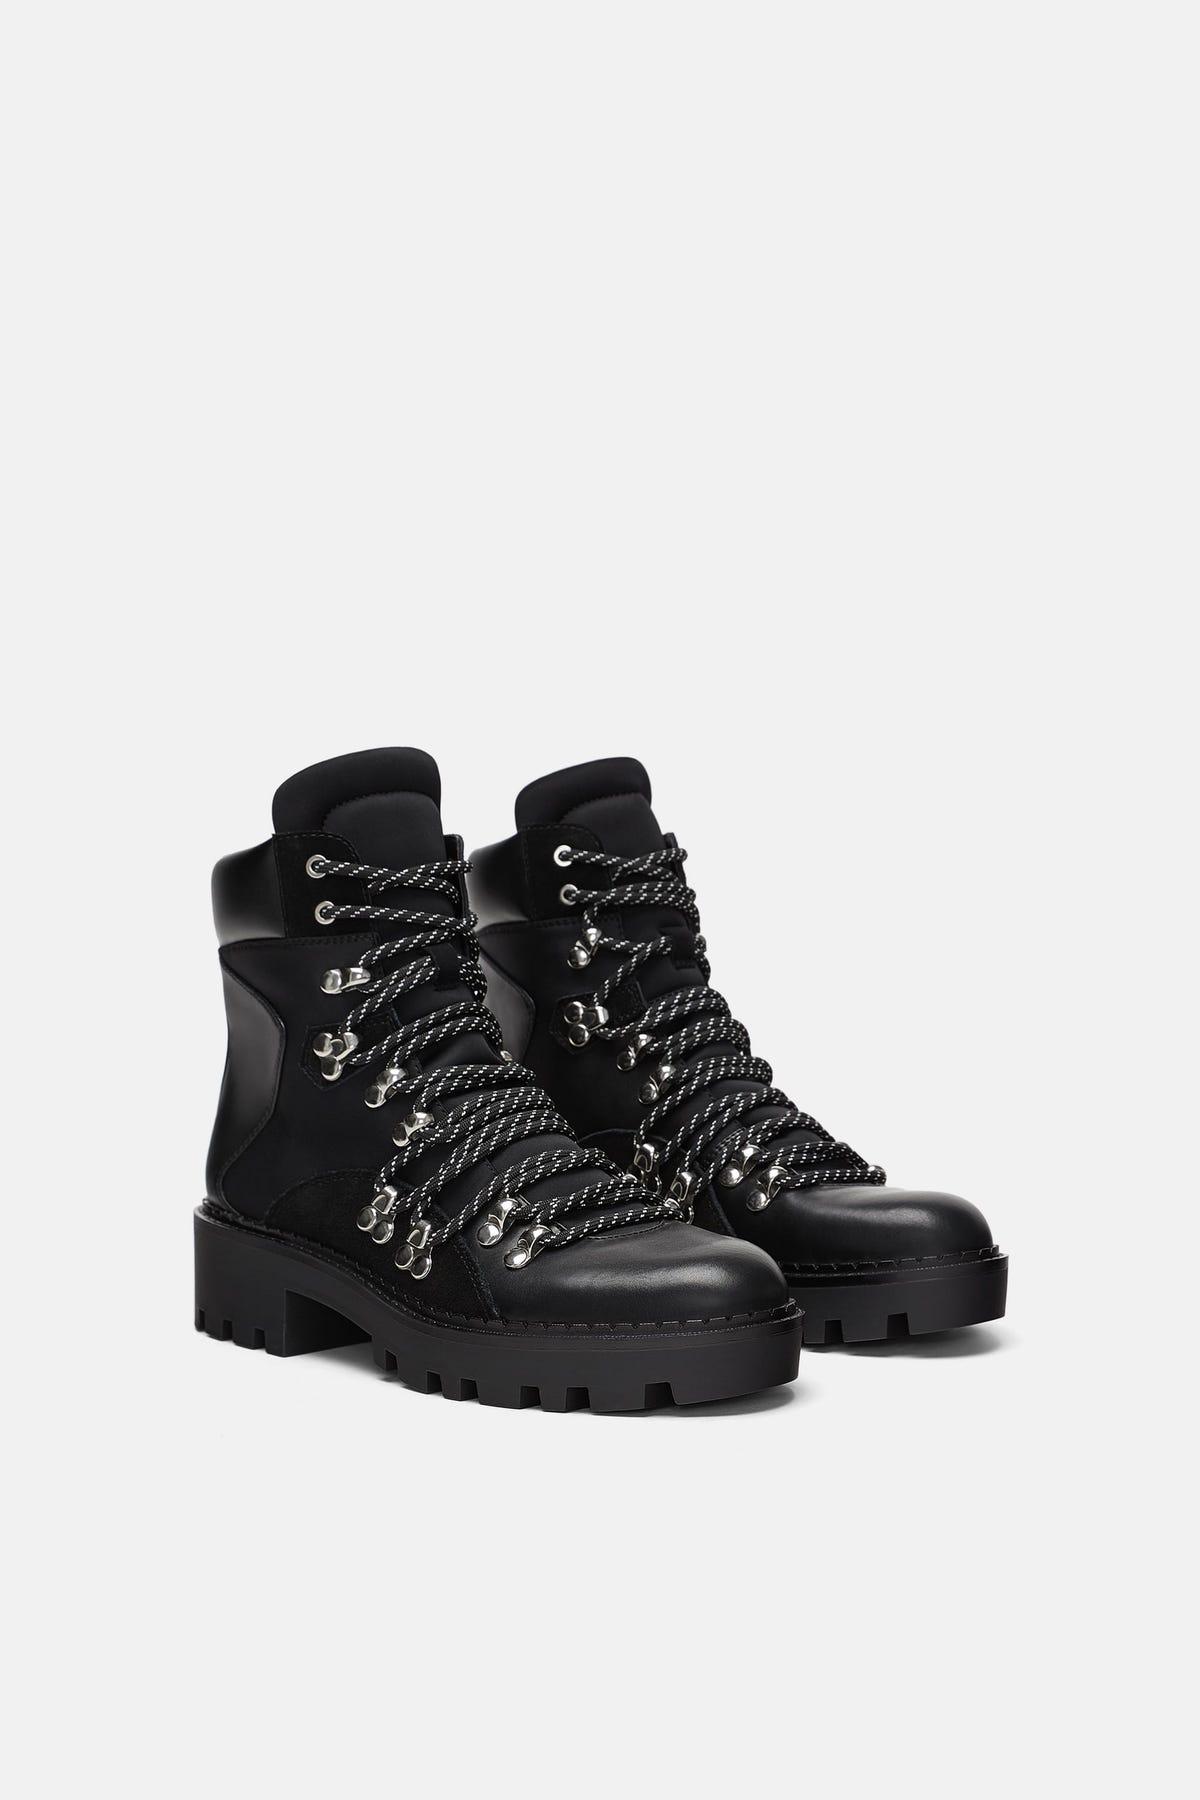 Billiger Preis anerkannte Marken tolle sorten Best Womens Hiking Boots, Shoes For Good Deals - 2018